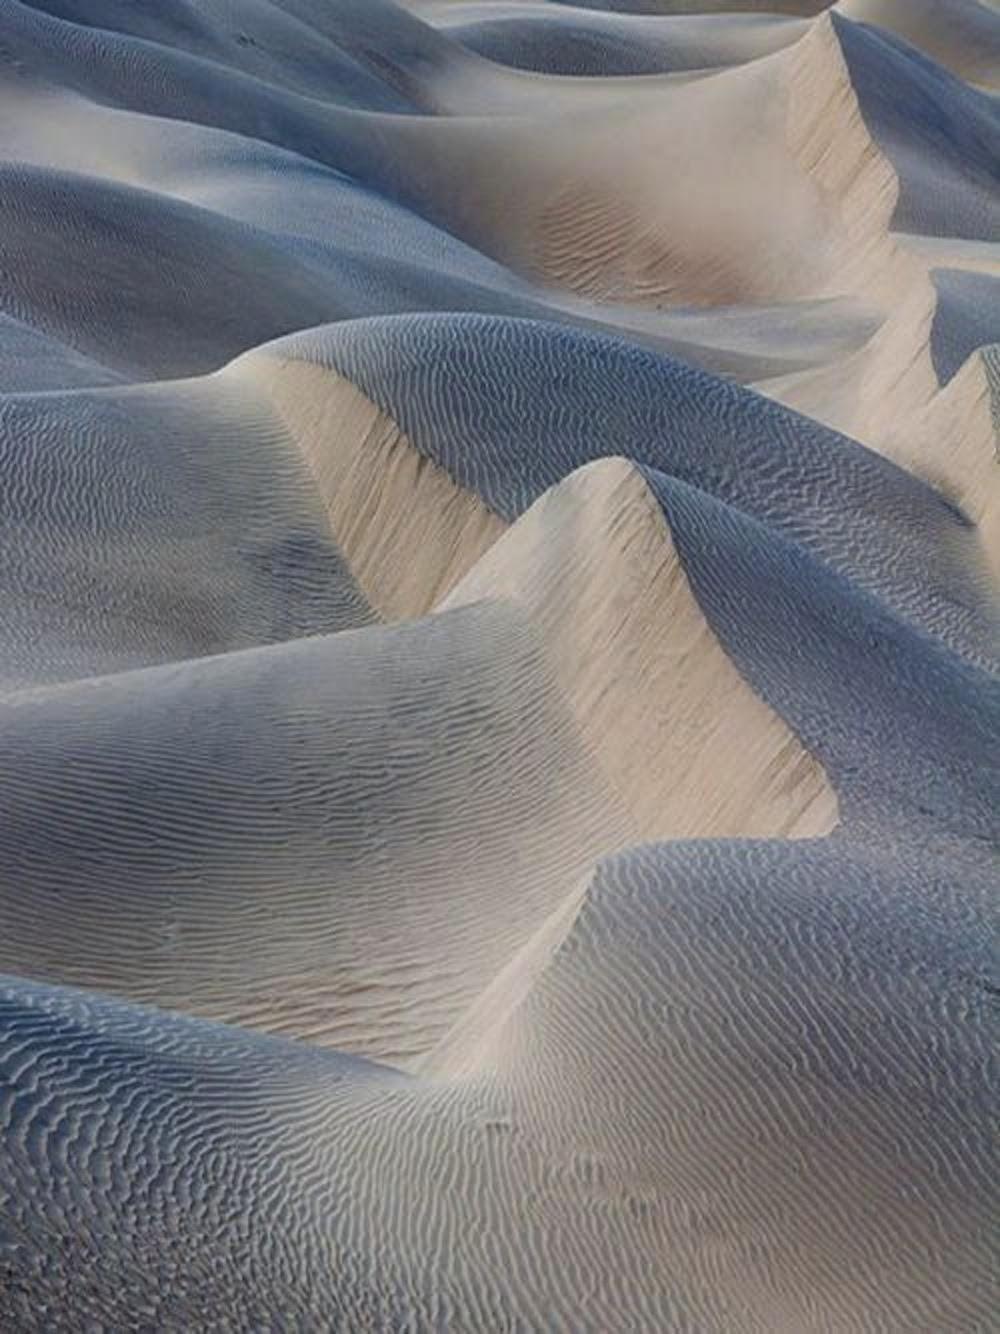 sand-dunes-inspo-neutrals-oracle-fox